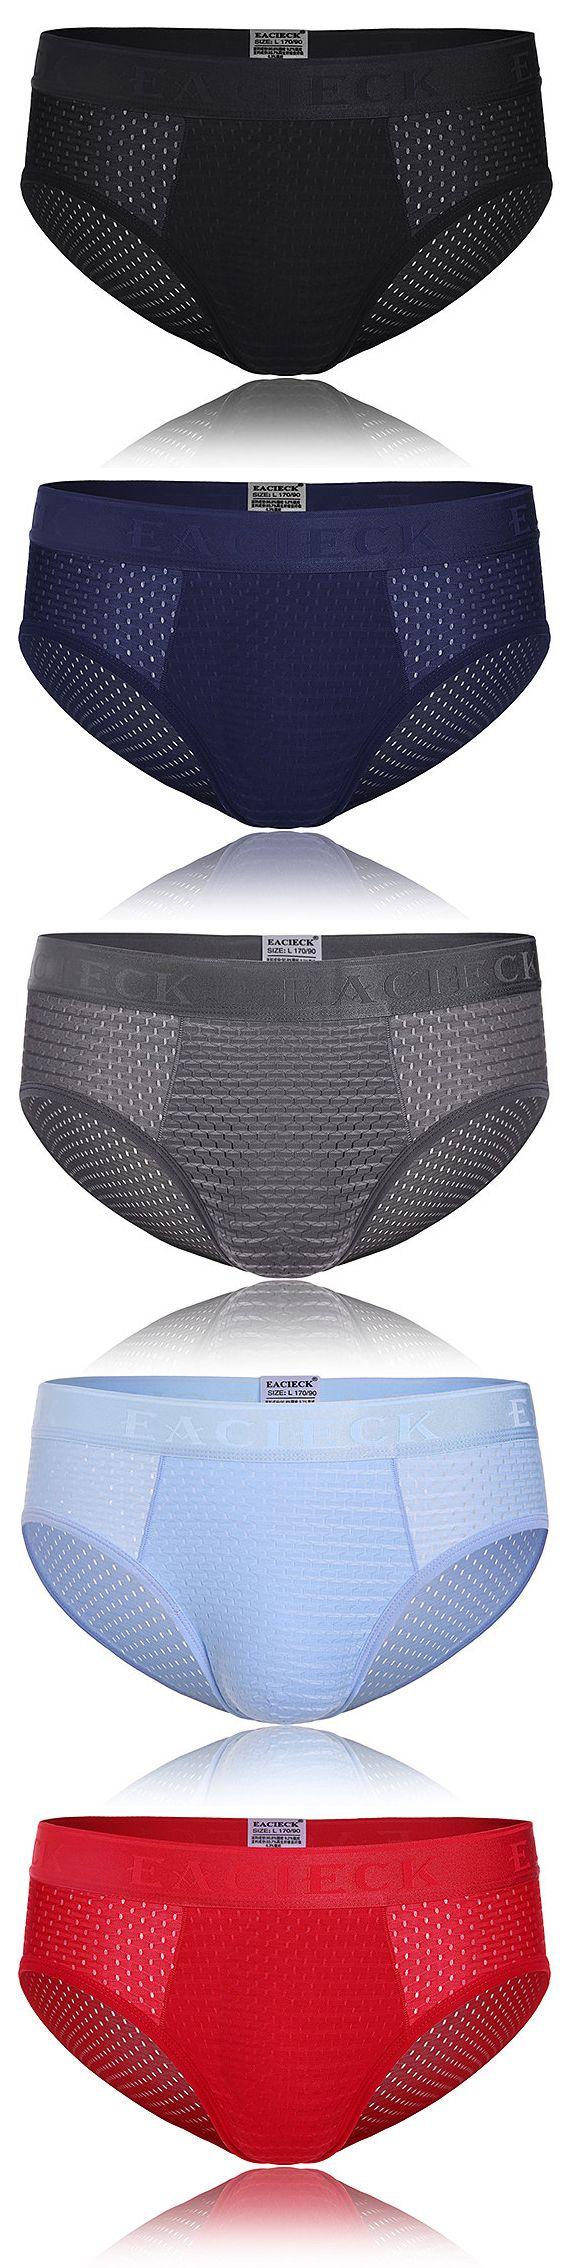 Sexy Mesh Ice Silk U Convex Breathable Bamboo Fiber Briefs Underwear for Men